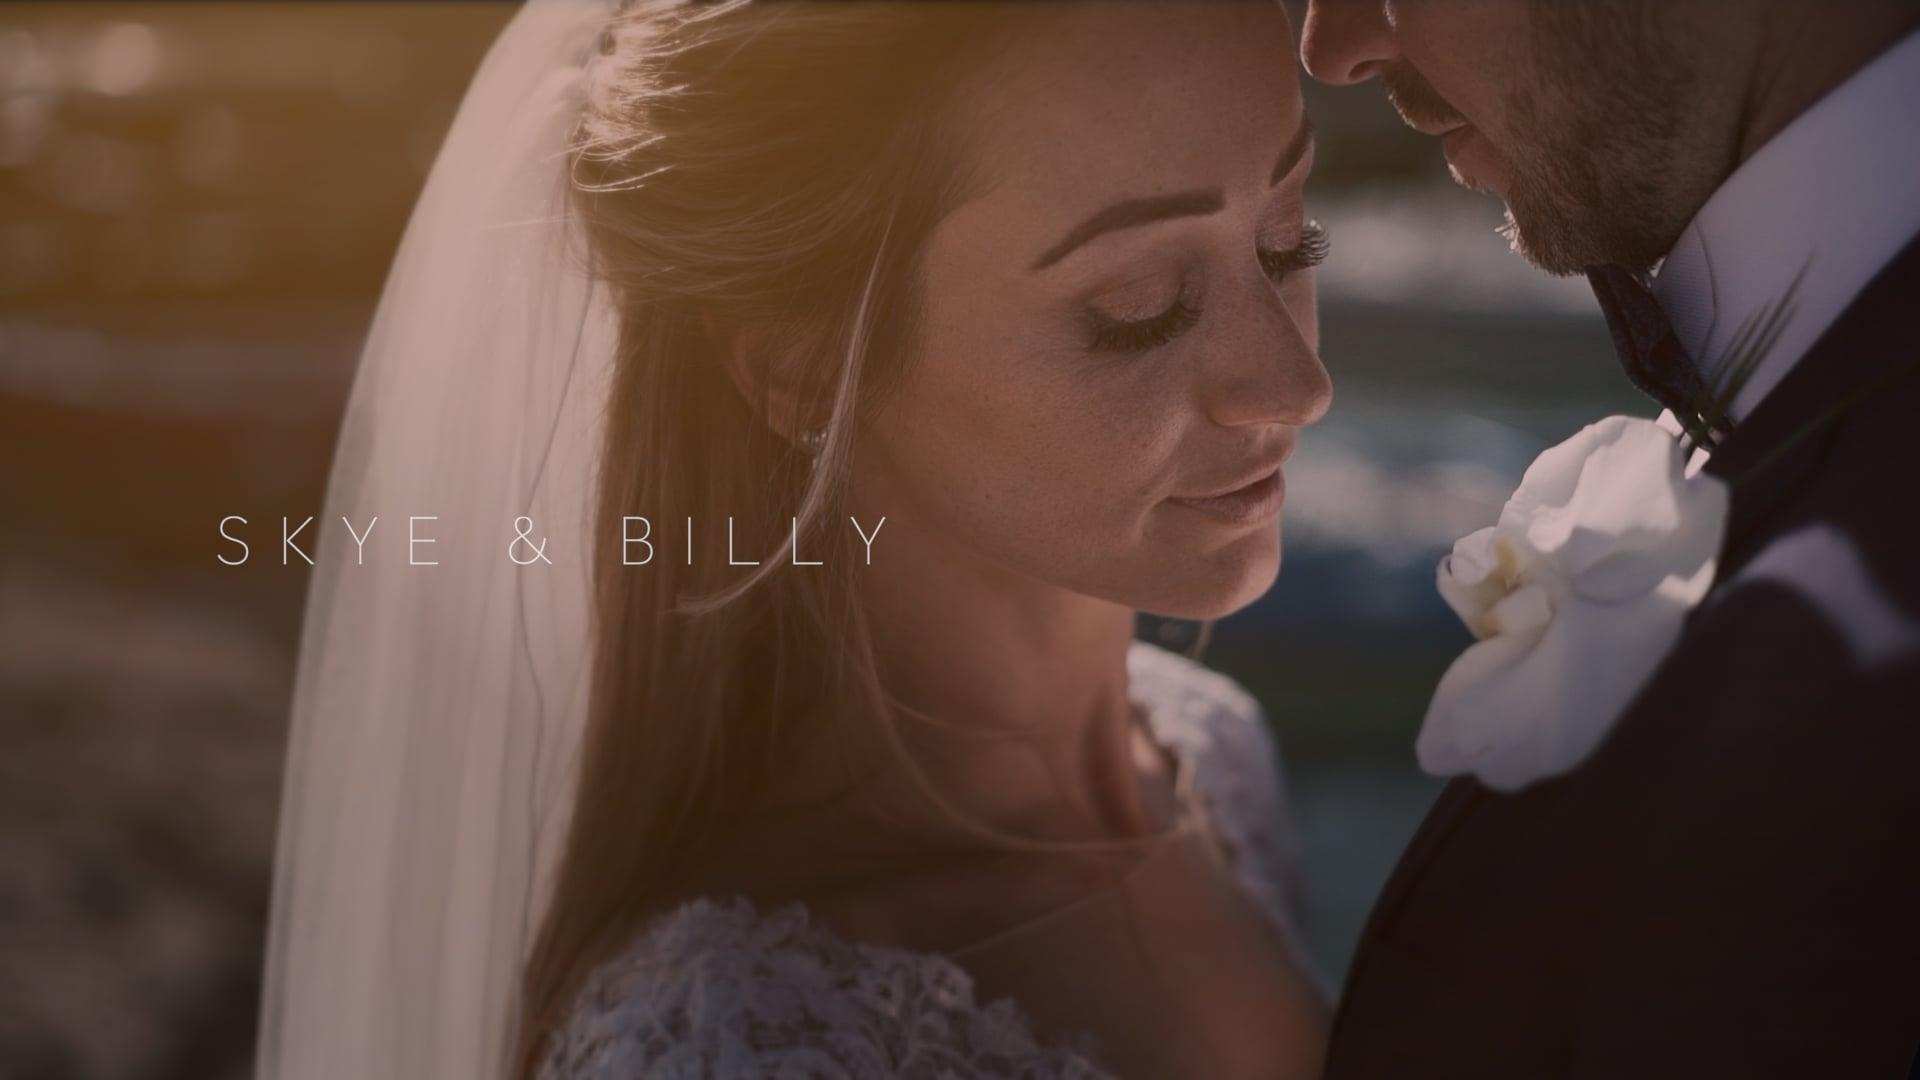 Skye & Billy | Trailer